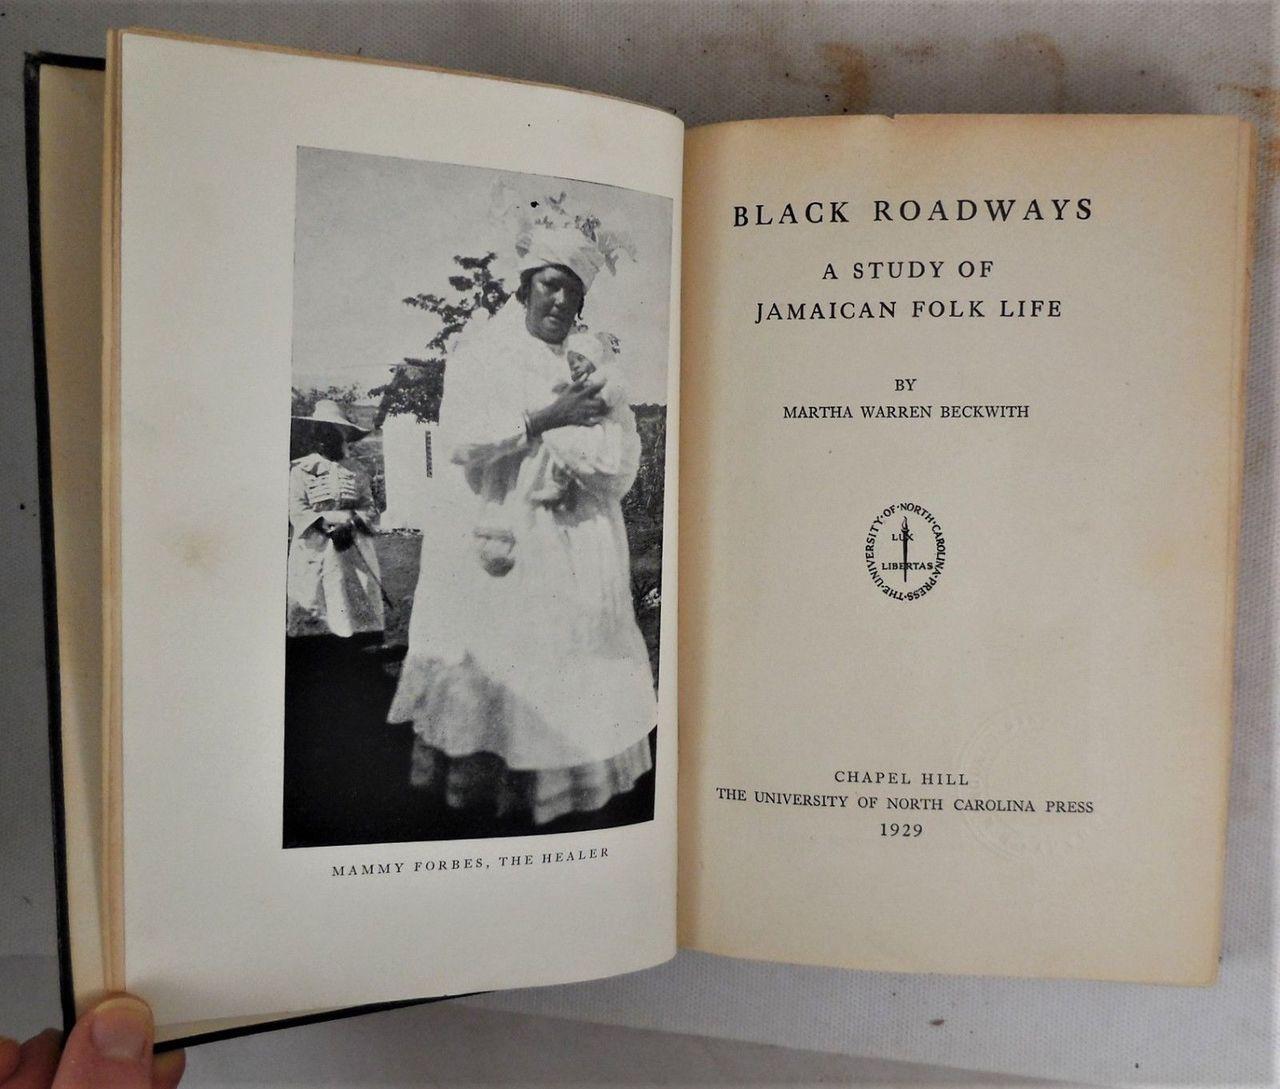 BLACK ROADWAYS: A STUDY OF JAMAICAN FOLK LIFE, by Martha Warren Beckwith - 1929